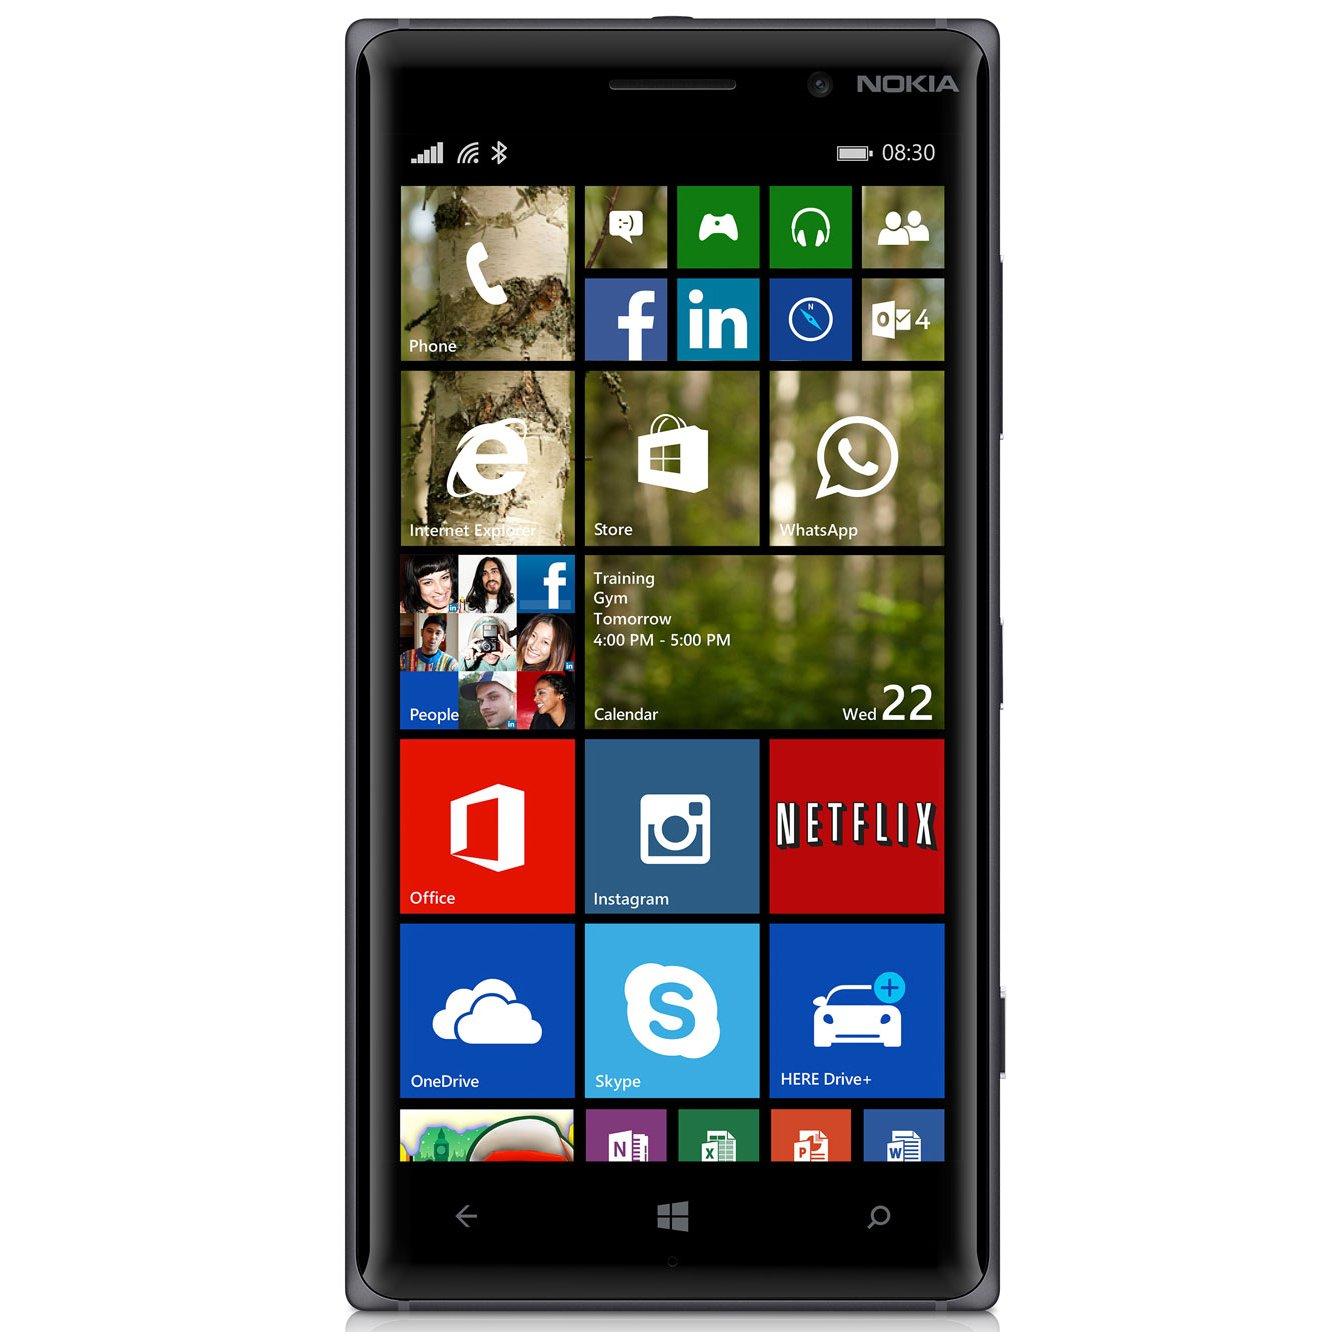 Nokia lumia 830 t mobile - Amazon Com Nokia Lumia 830 Rm 985 16gb Factory Unlocked Us Warranty White Cell Phones Accessories